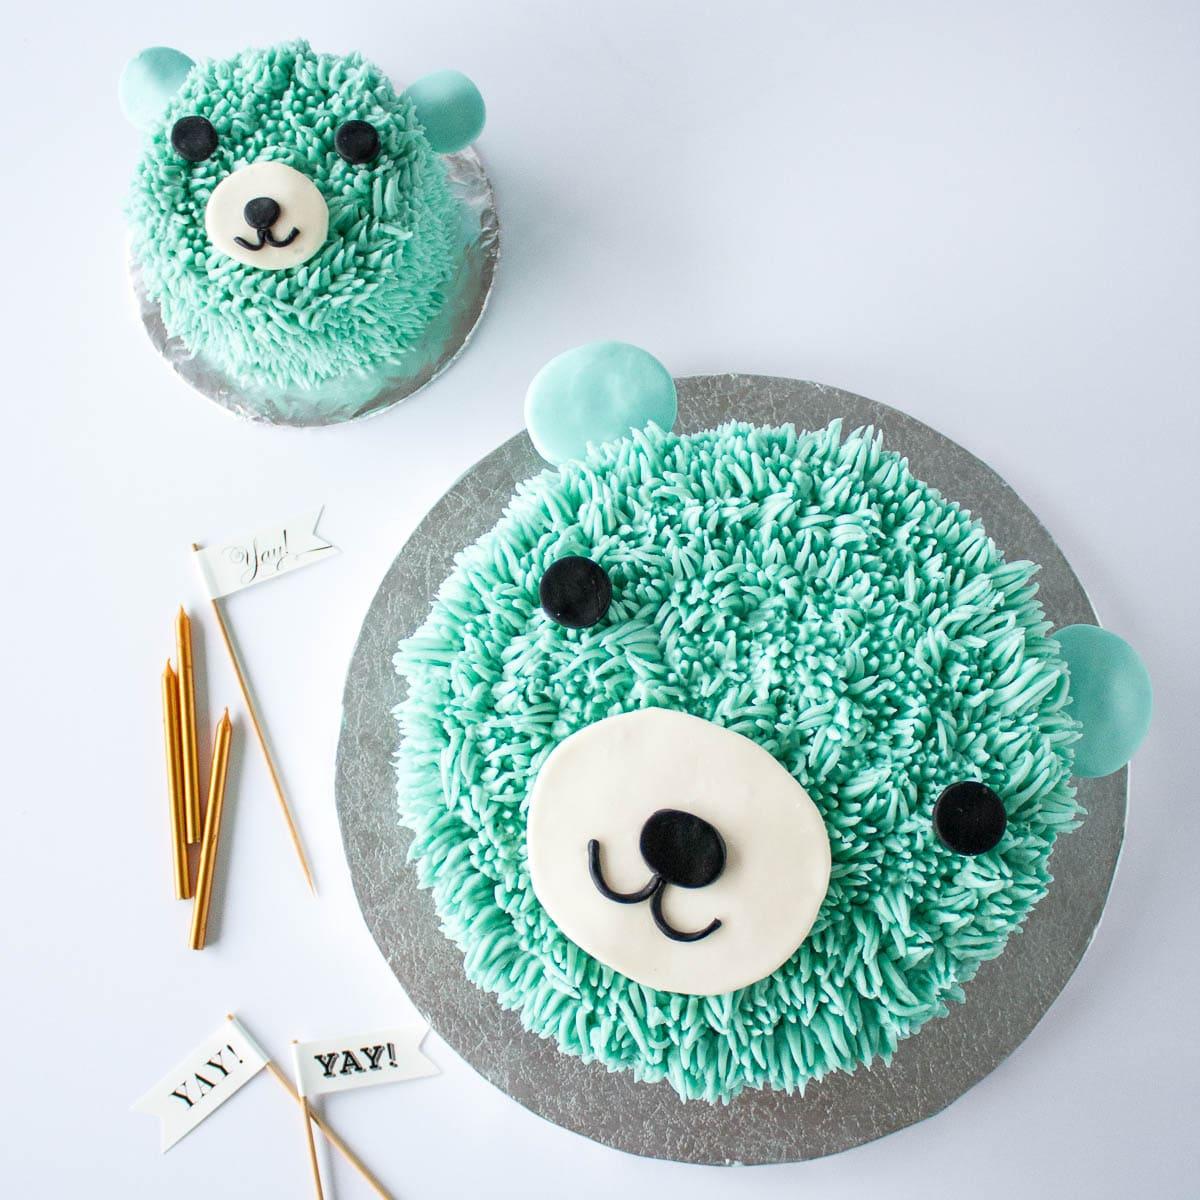 Swell Blue Bear Birthday Cake Liv For Cake Funny Birthday Cards Online Aeocydamsfinfo